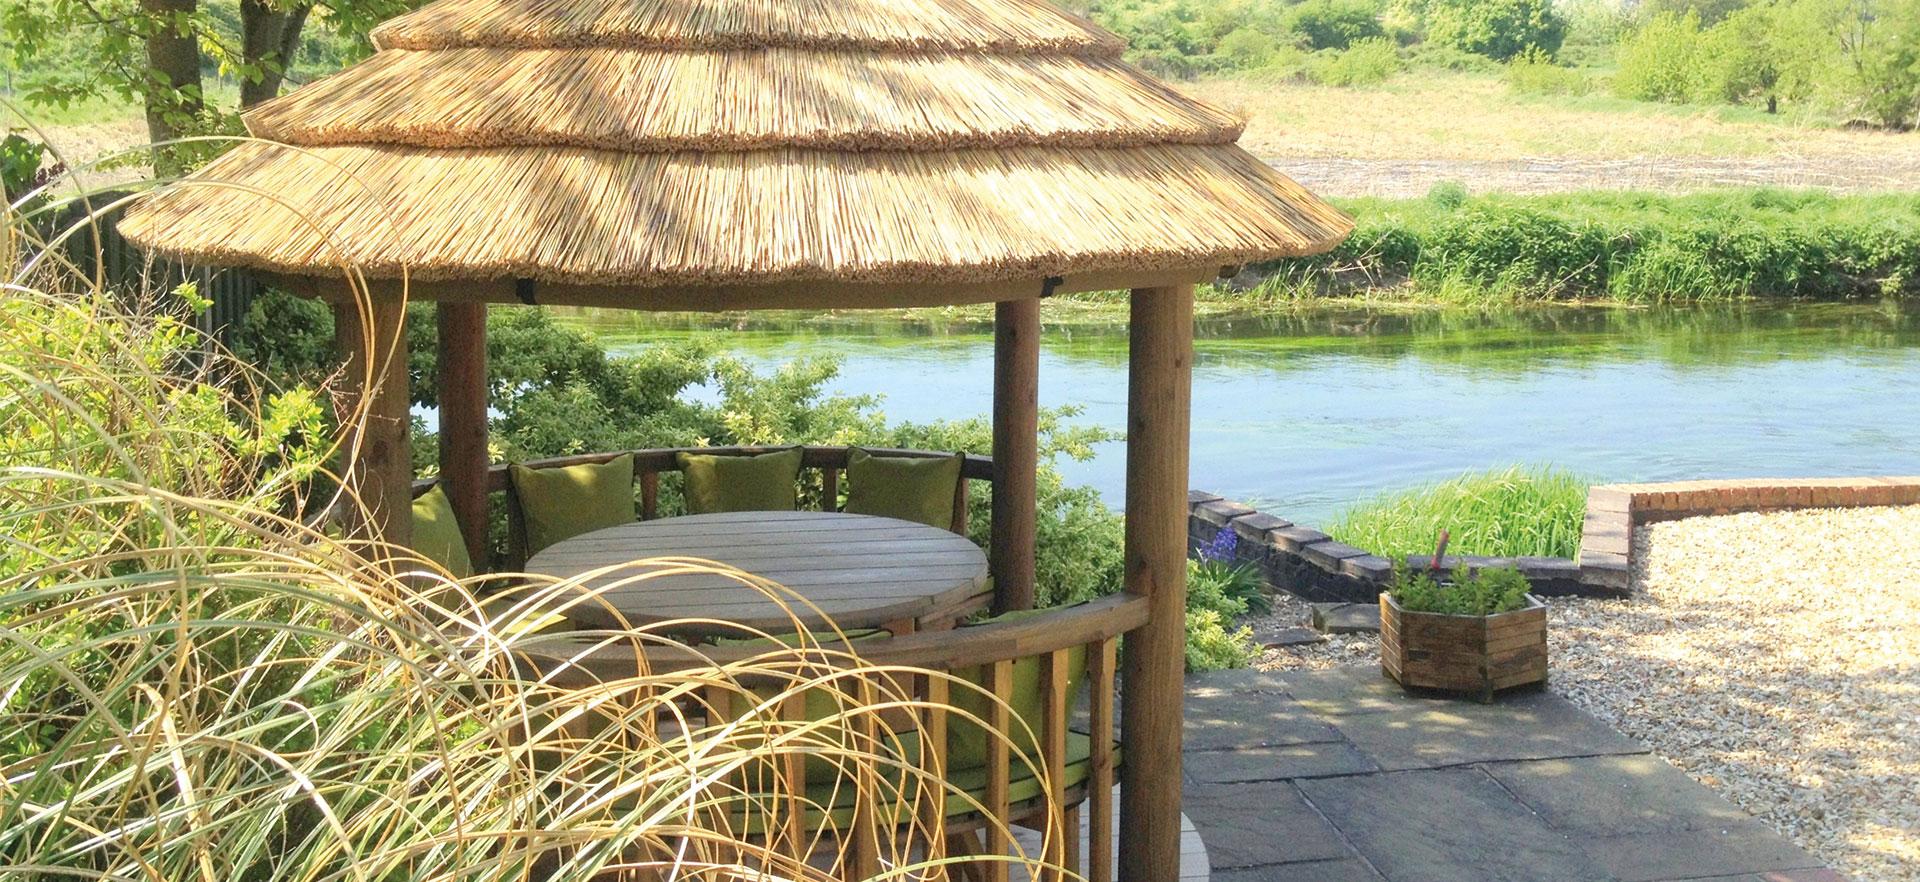 2.5 metre thatched gazebo overlooking waterfront